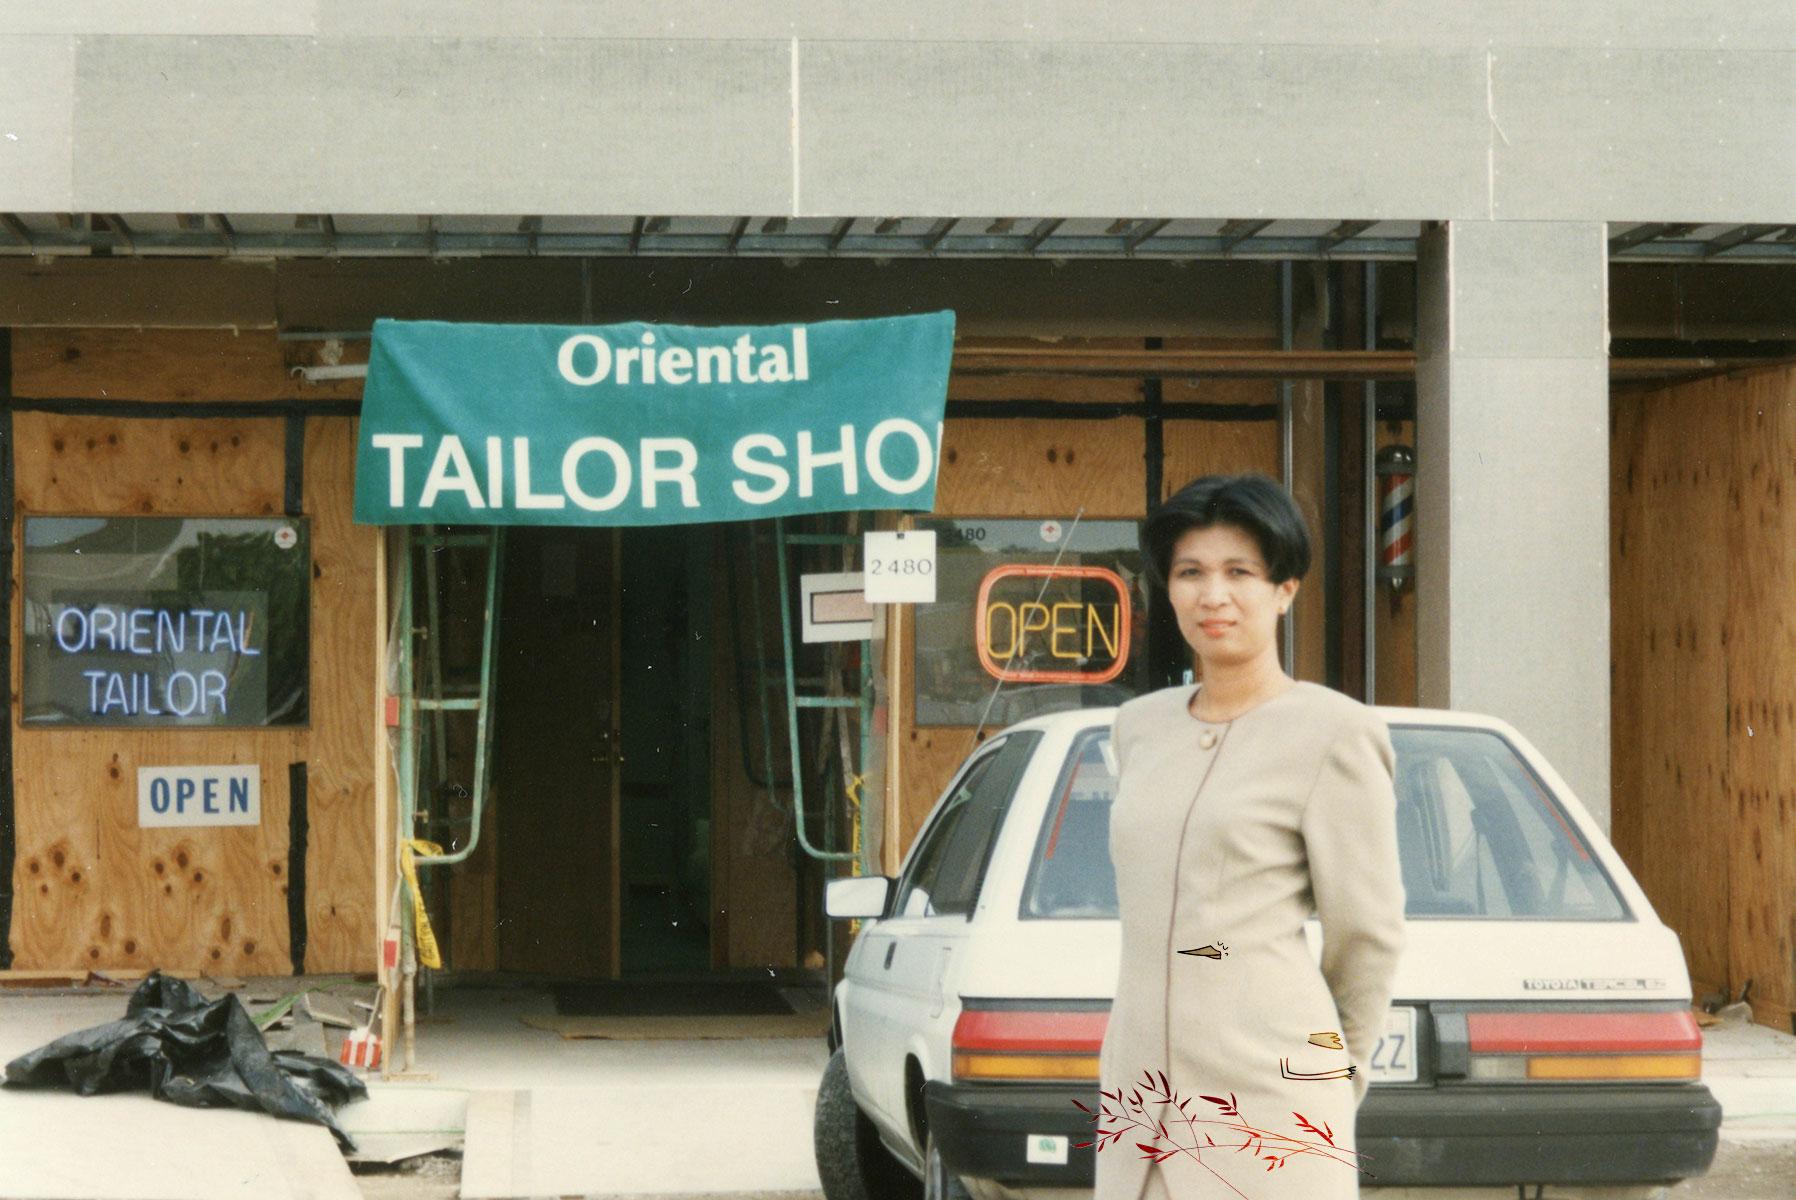 oriental-tailor-shop_embroidered-dragon_x1200_190113_nh_v1.0.1_lr.jpg